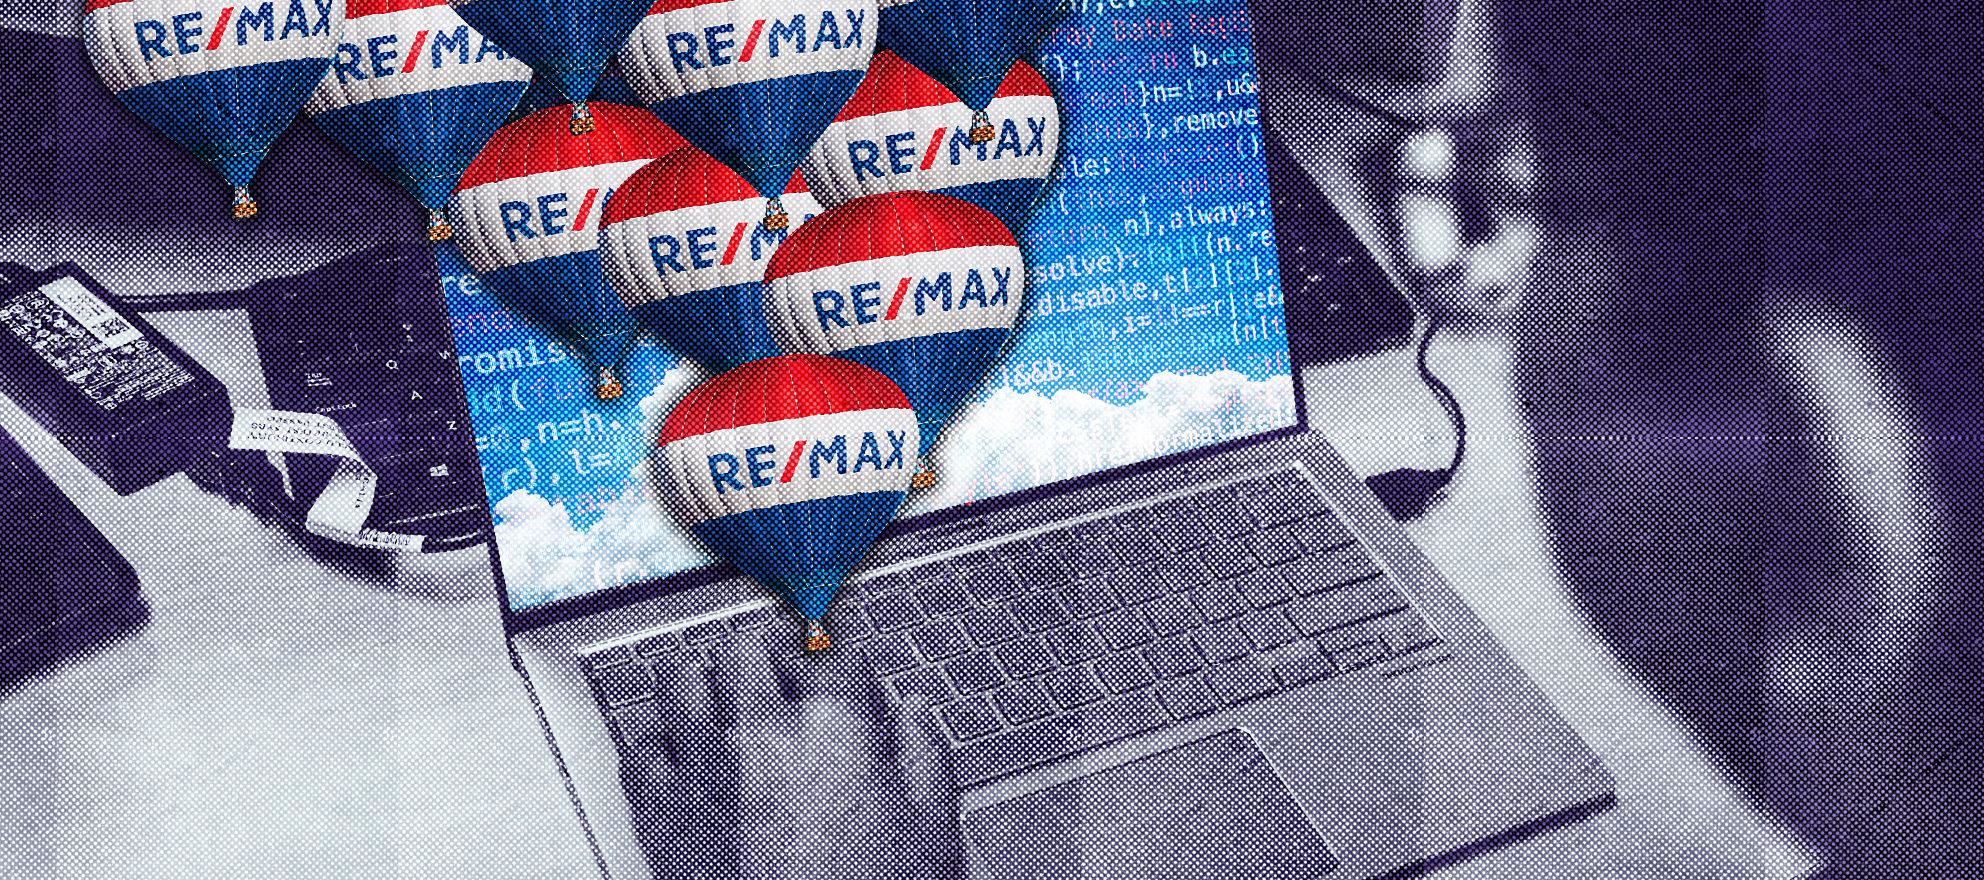 RE/MAX tech platform moves ahead. Paid version next?